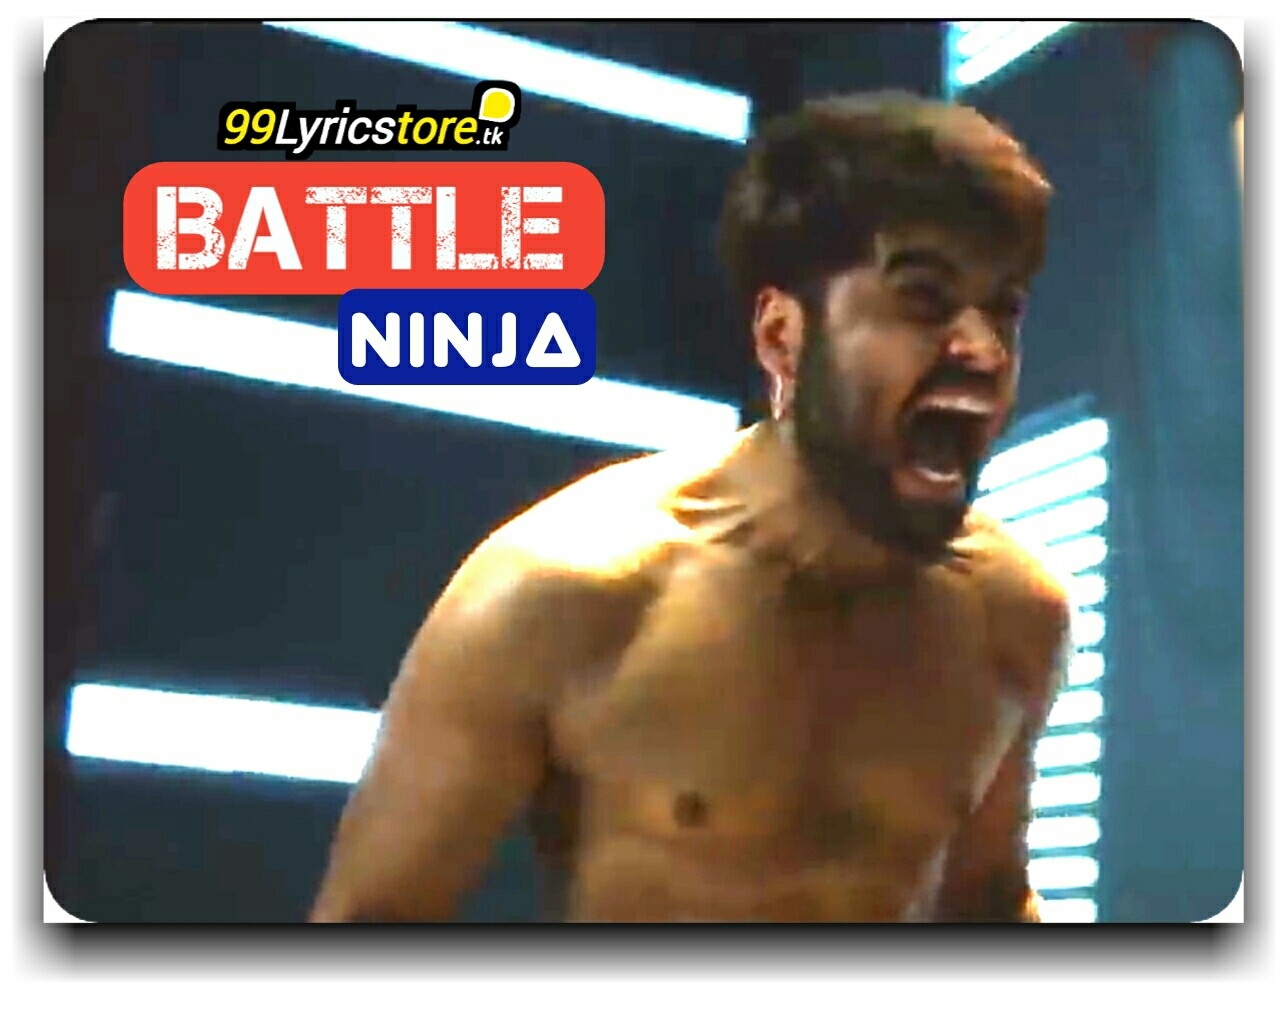 Ninja song lyrics, latest Punjabi song 2018, Latest Punjabi Song Lyrics, Battle new Punjabi song lyrics, Ninja Punjabi song lyrics, Punjabi song of Ninja,